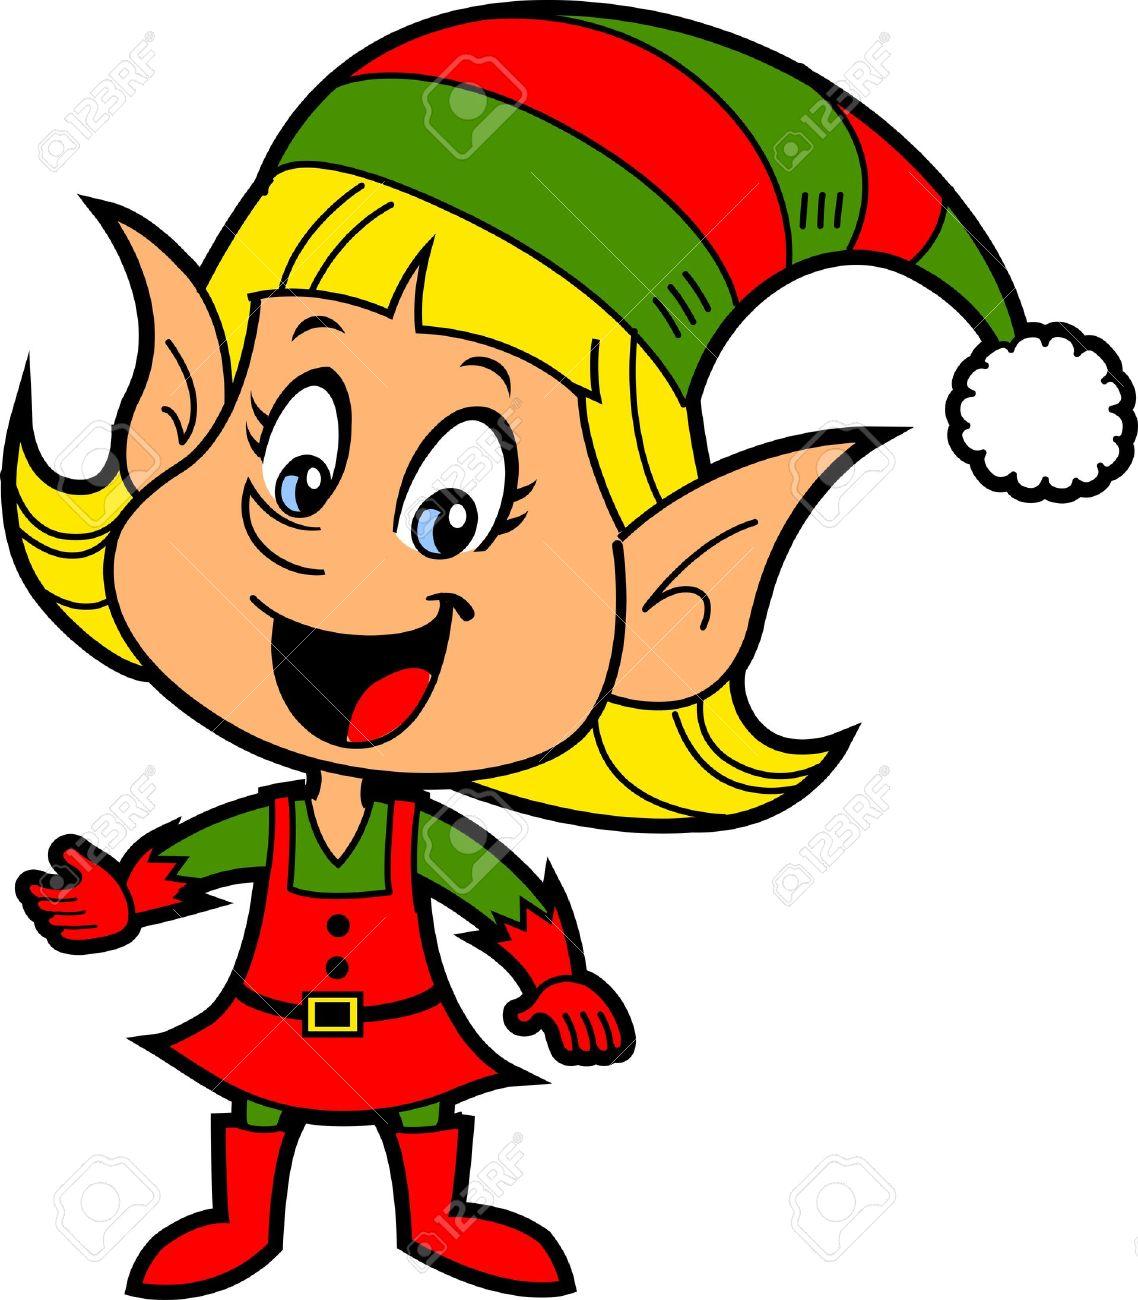 Happy Smiling Blonde Girl Christmas Santa's Elf Stock Vector - 20686734